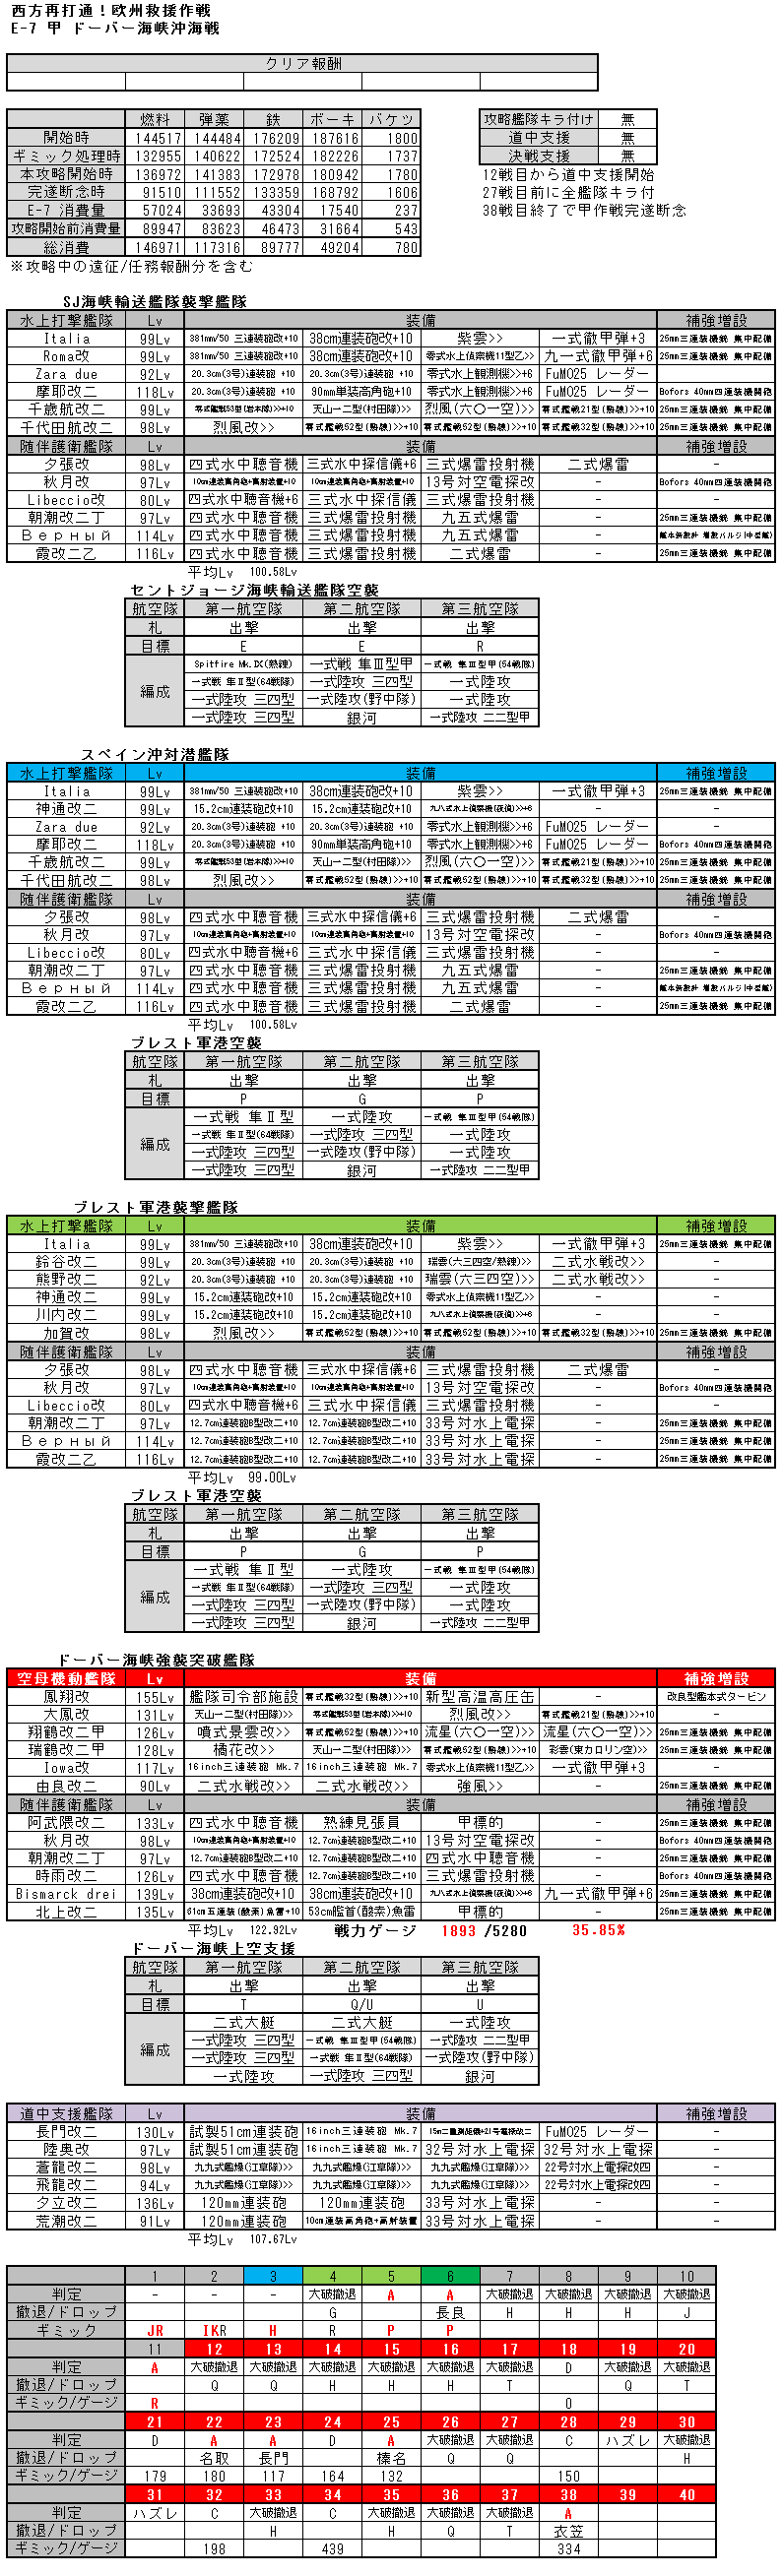 201708 E-7甲断念